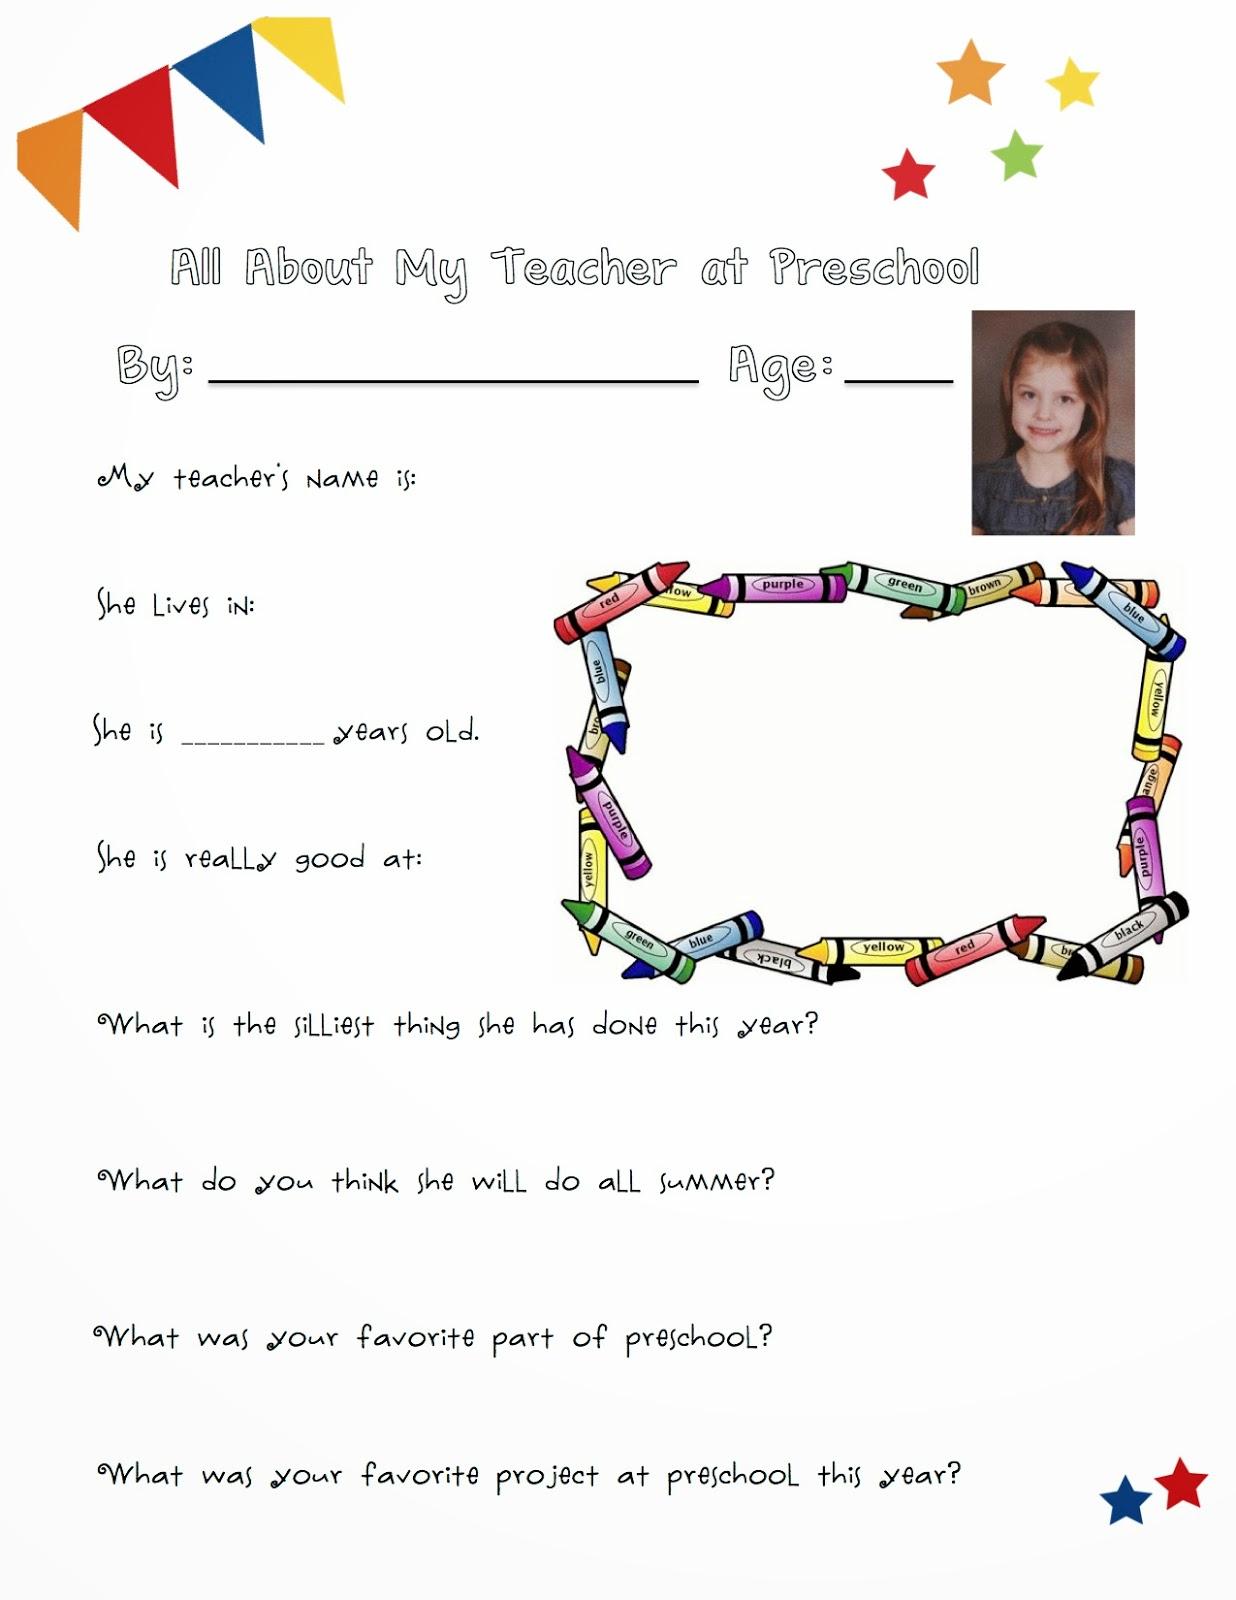 Ordinary Miracles Of Life Preschool Teacher T